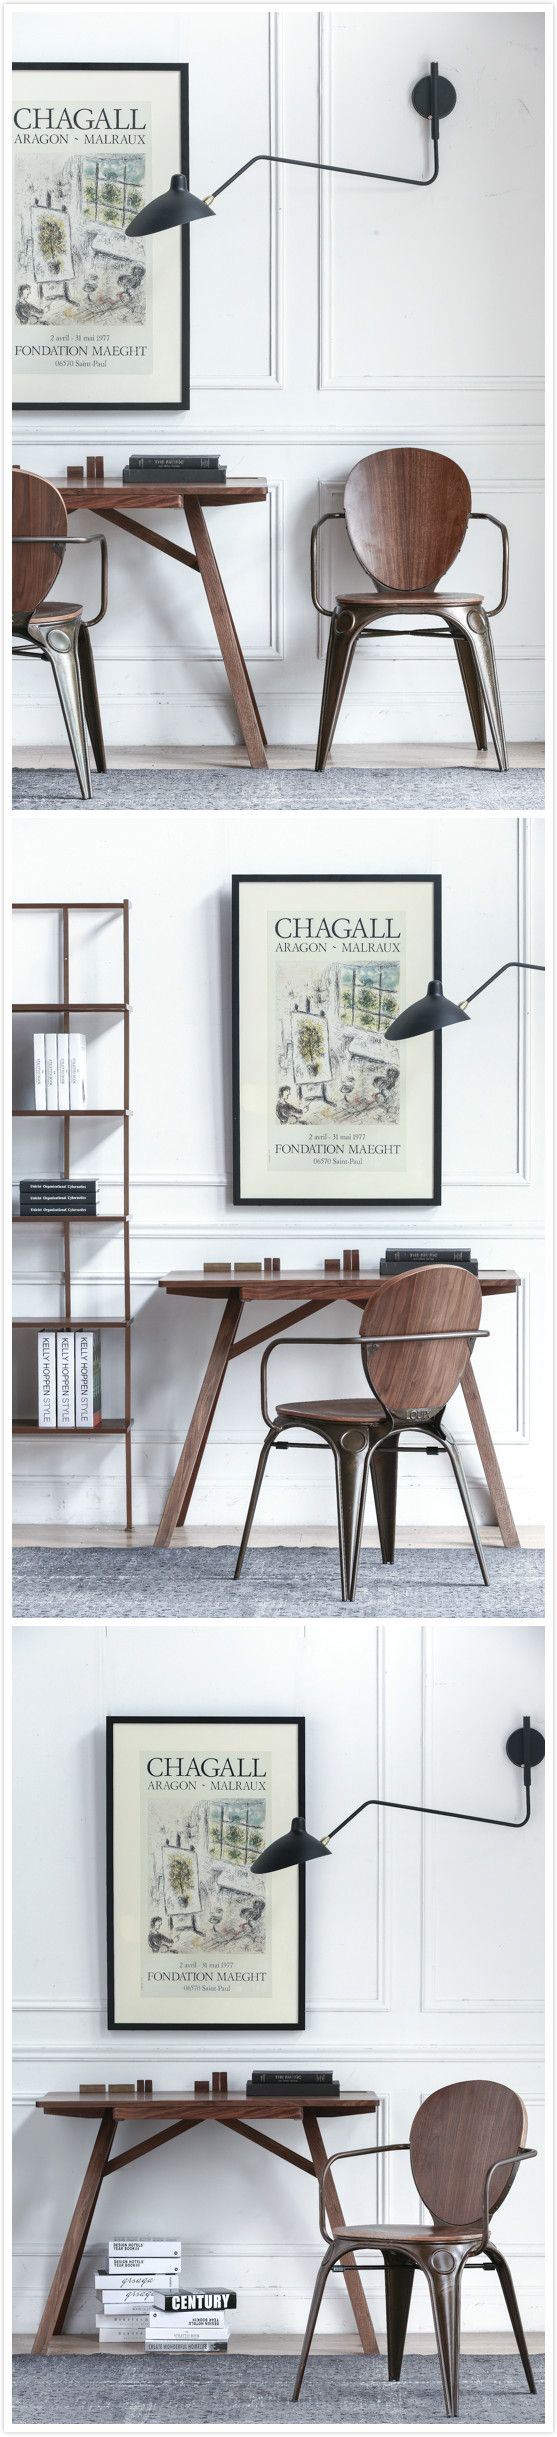 Louix Chair, photo by Emo Wong. #chair# #dinningroom# #louixchair# #livingroom# #interior# #homeoffice#